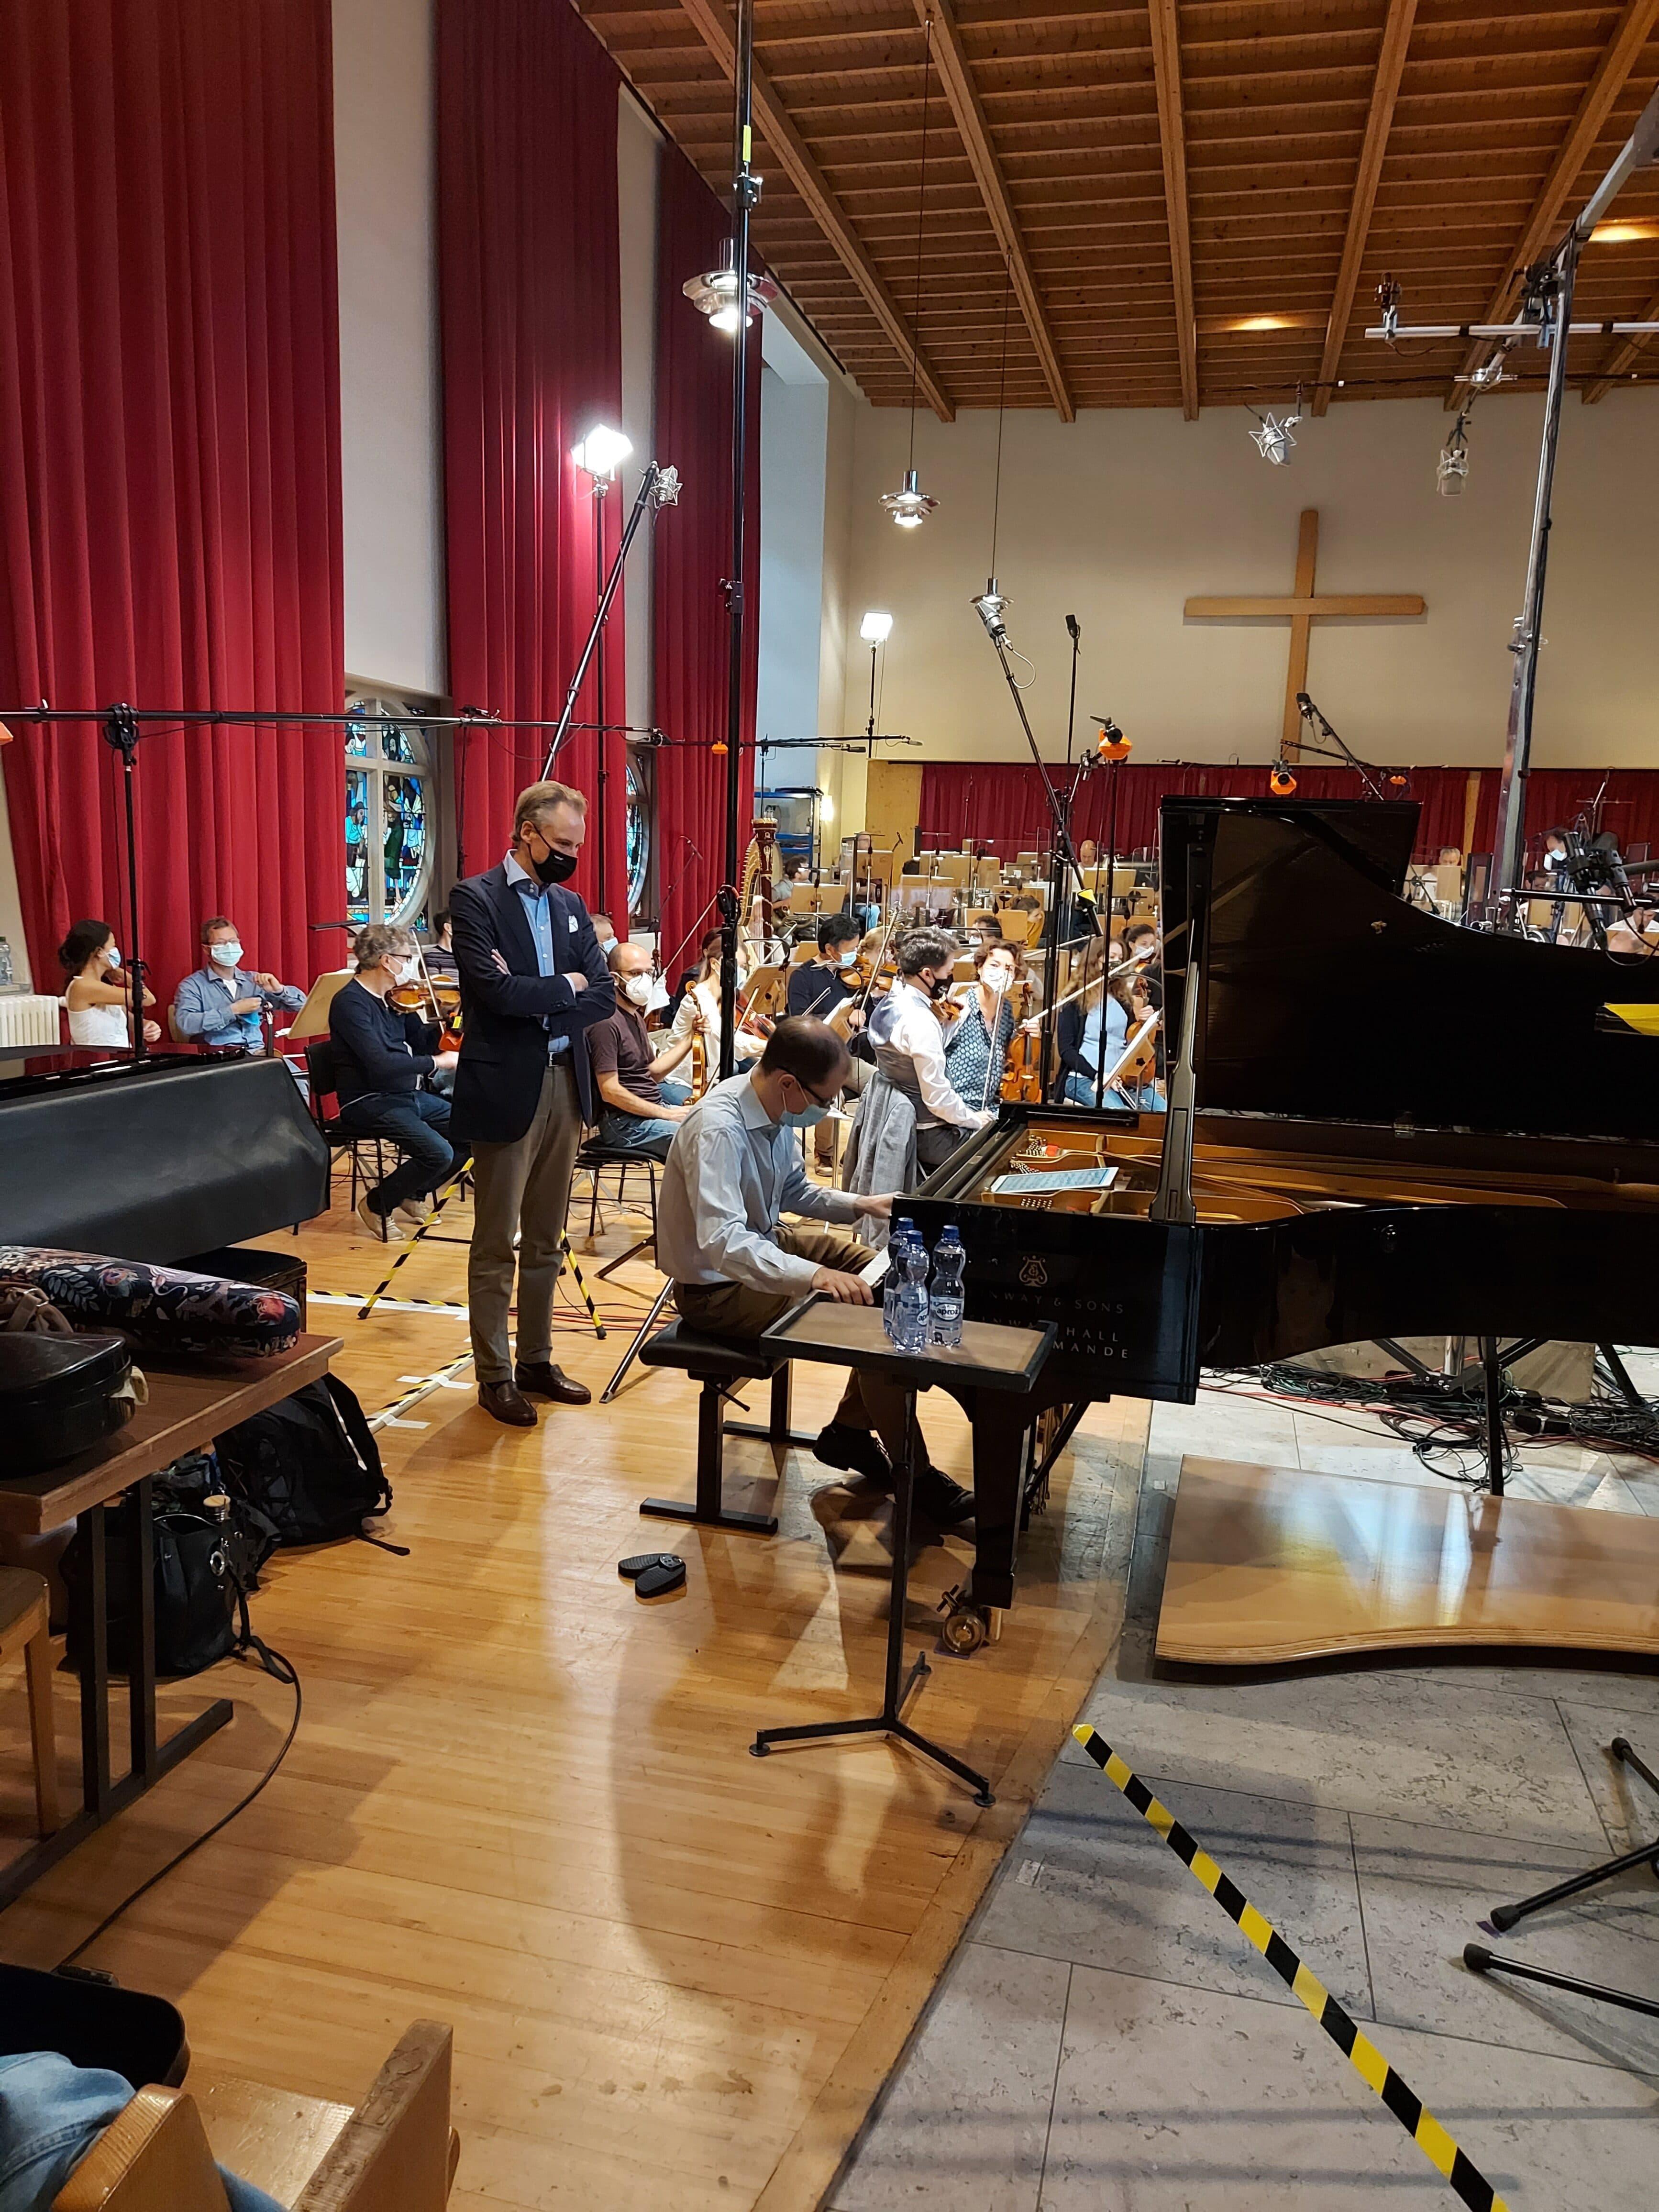 Kurt Leimer junior présent à l'enregistrement